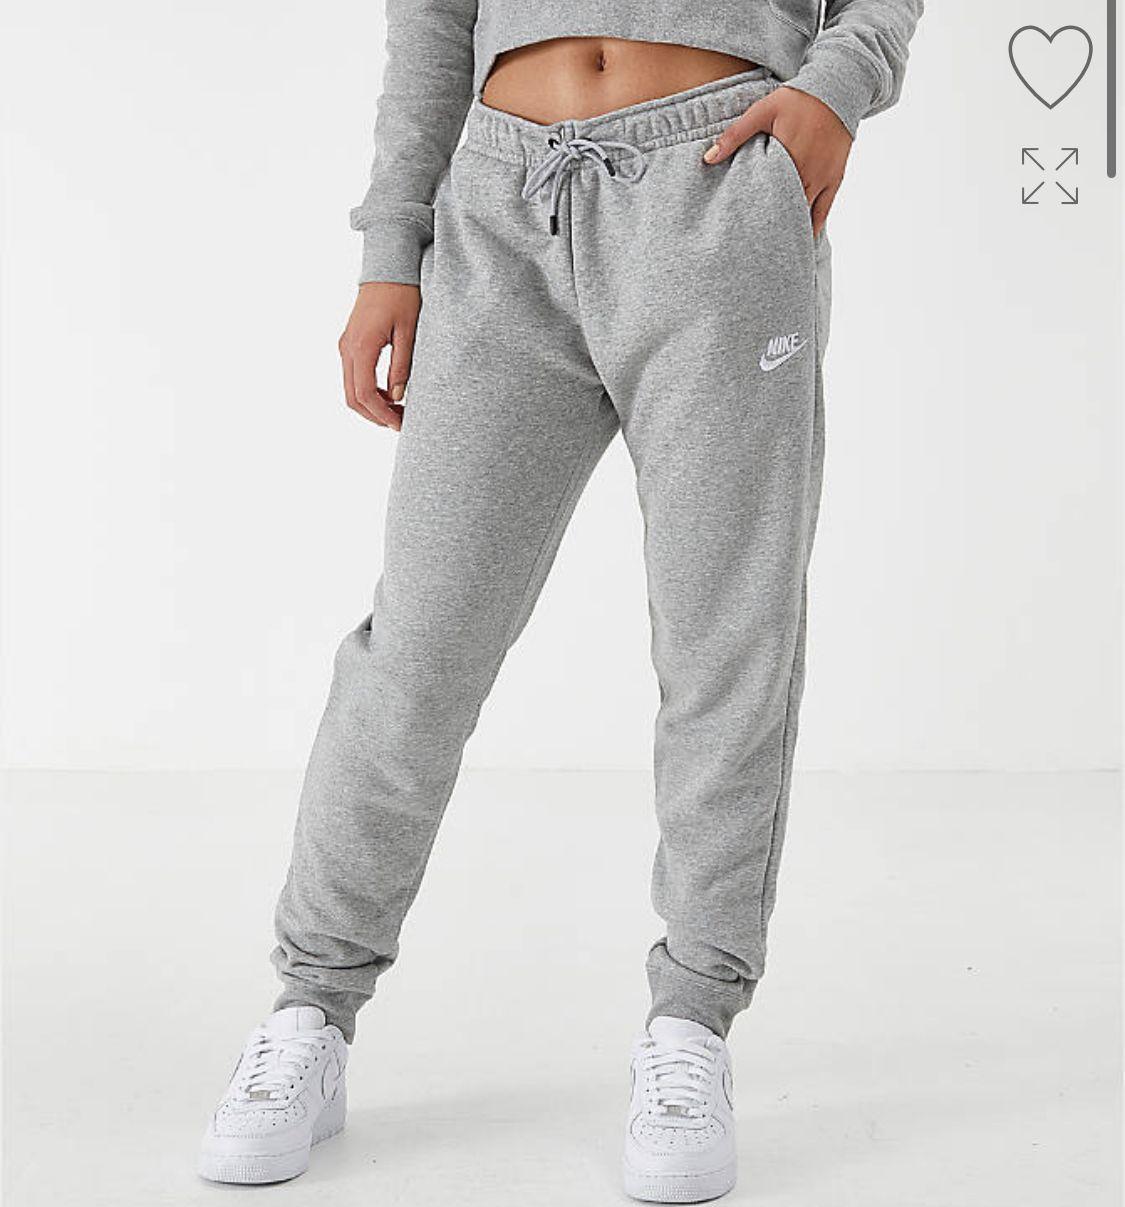 Pin by Miasanadah on birthday | Nike women sweatpants, Grey ...